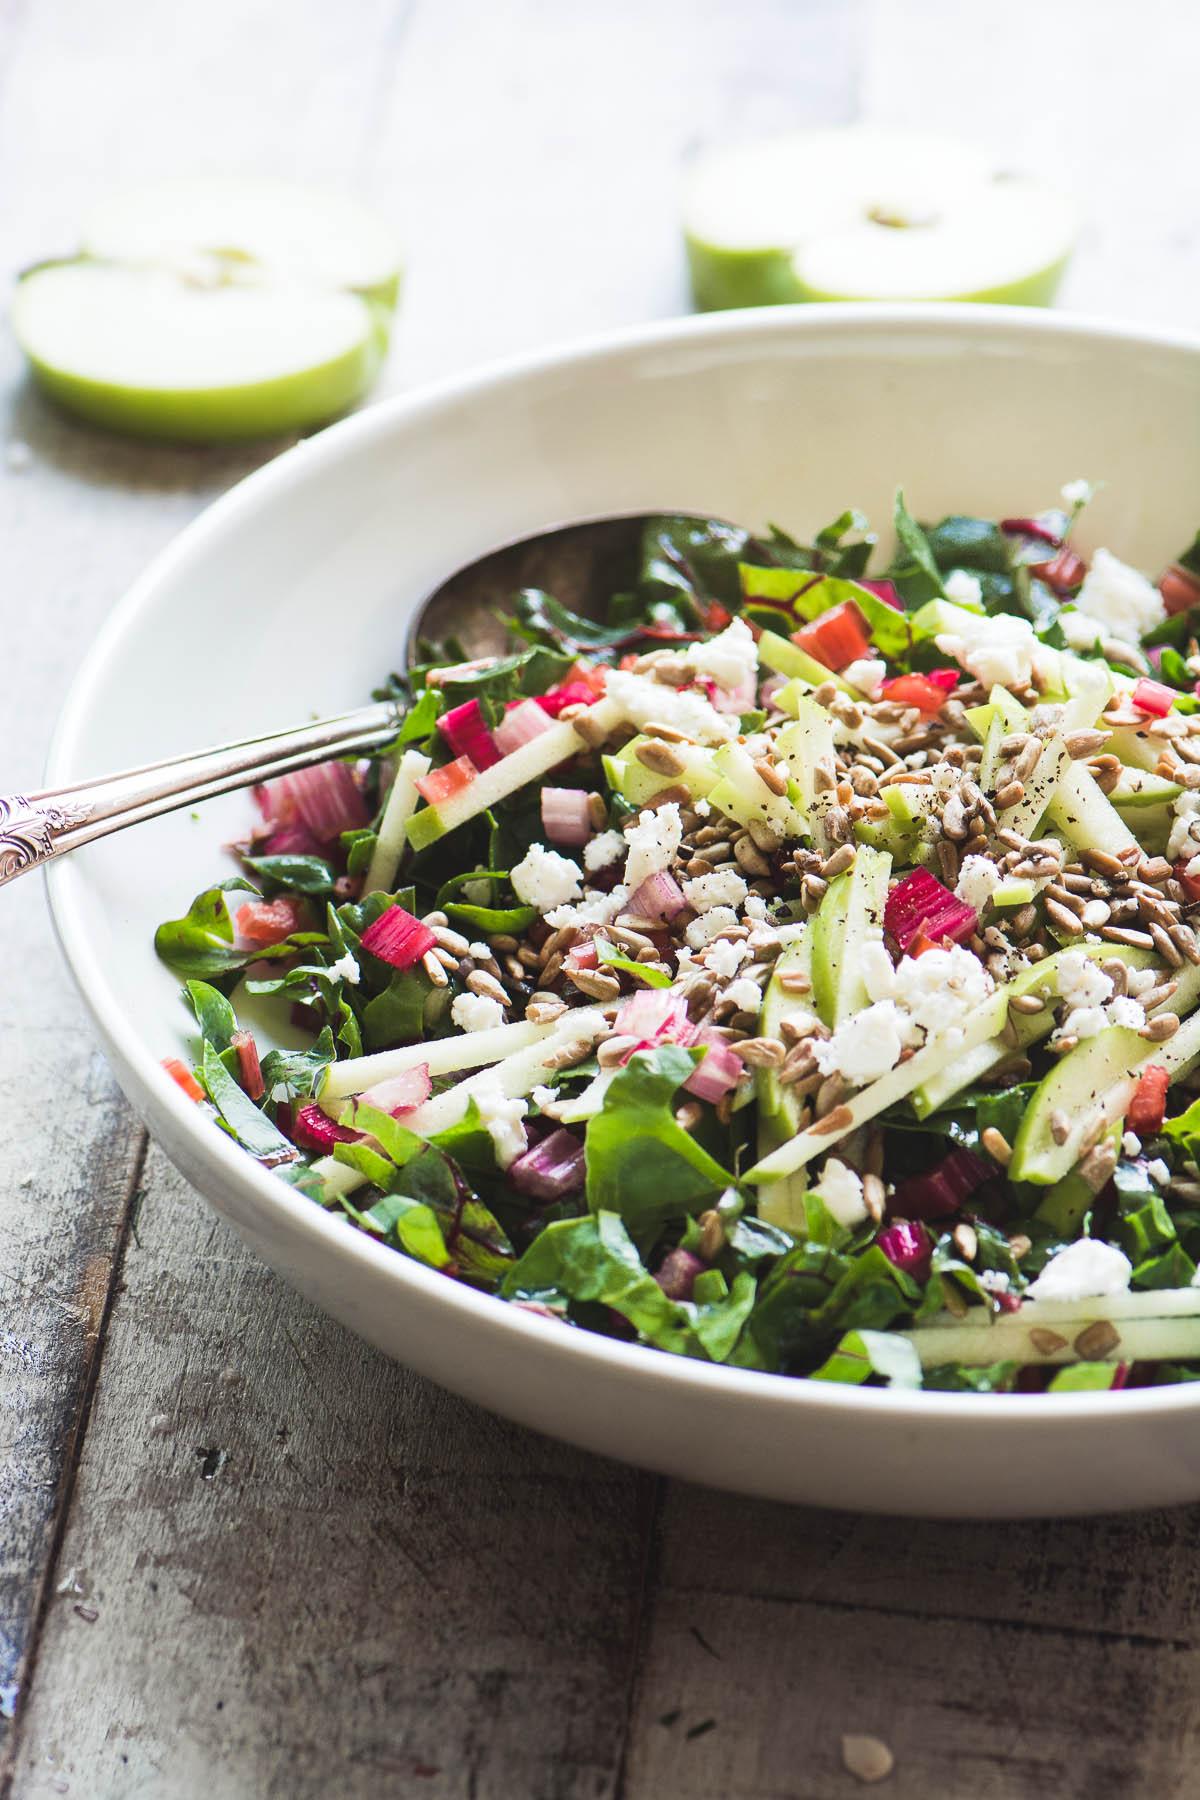 Raw rainbow chard salad